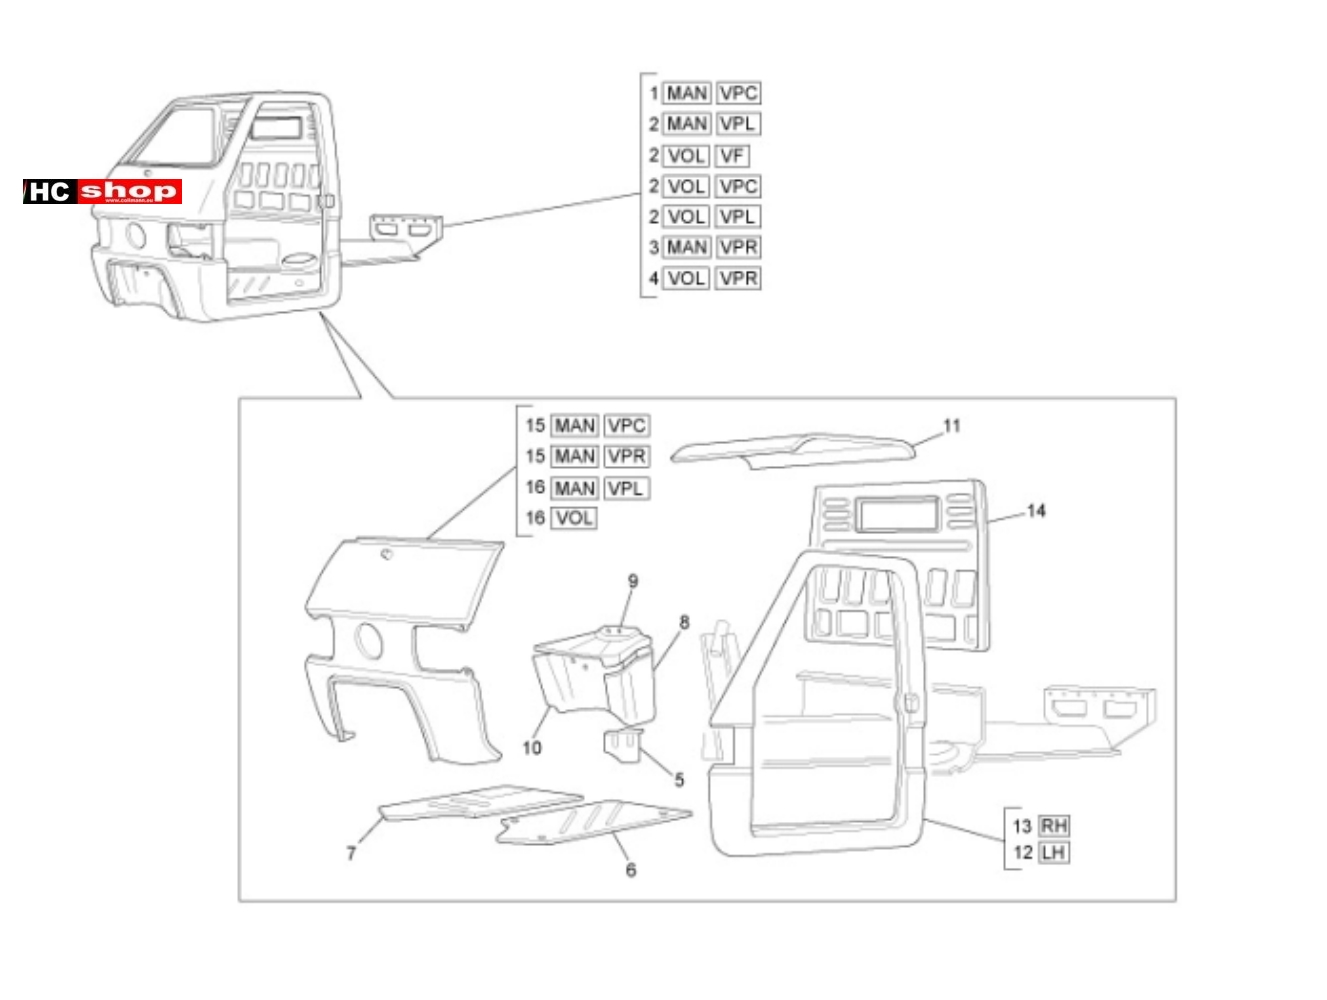 piaggio ape tm 703 fahrgestell karosserie ape tm 703. Black Bedroom Furniture Sets. Home Design Ideas